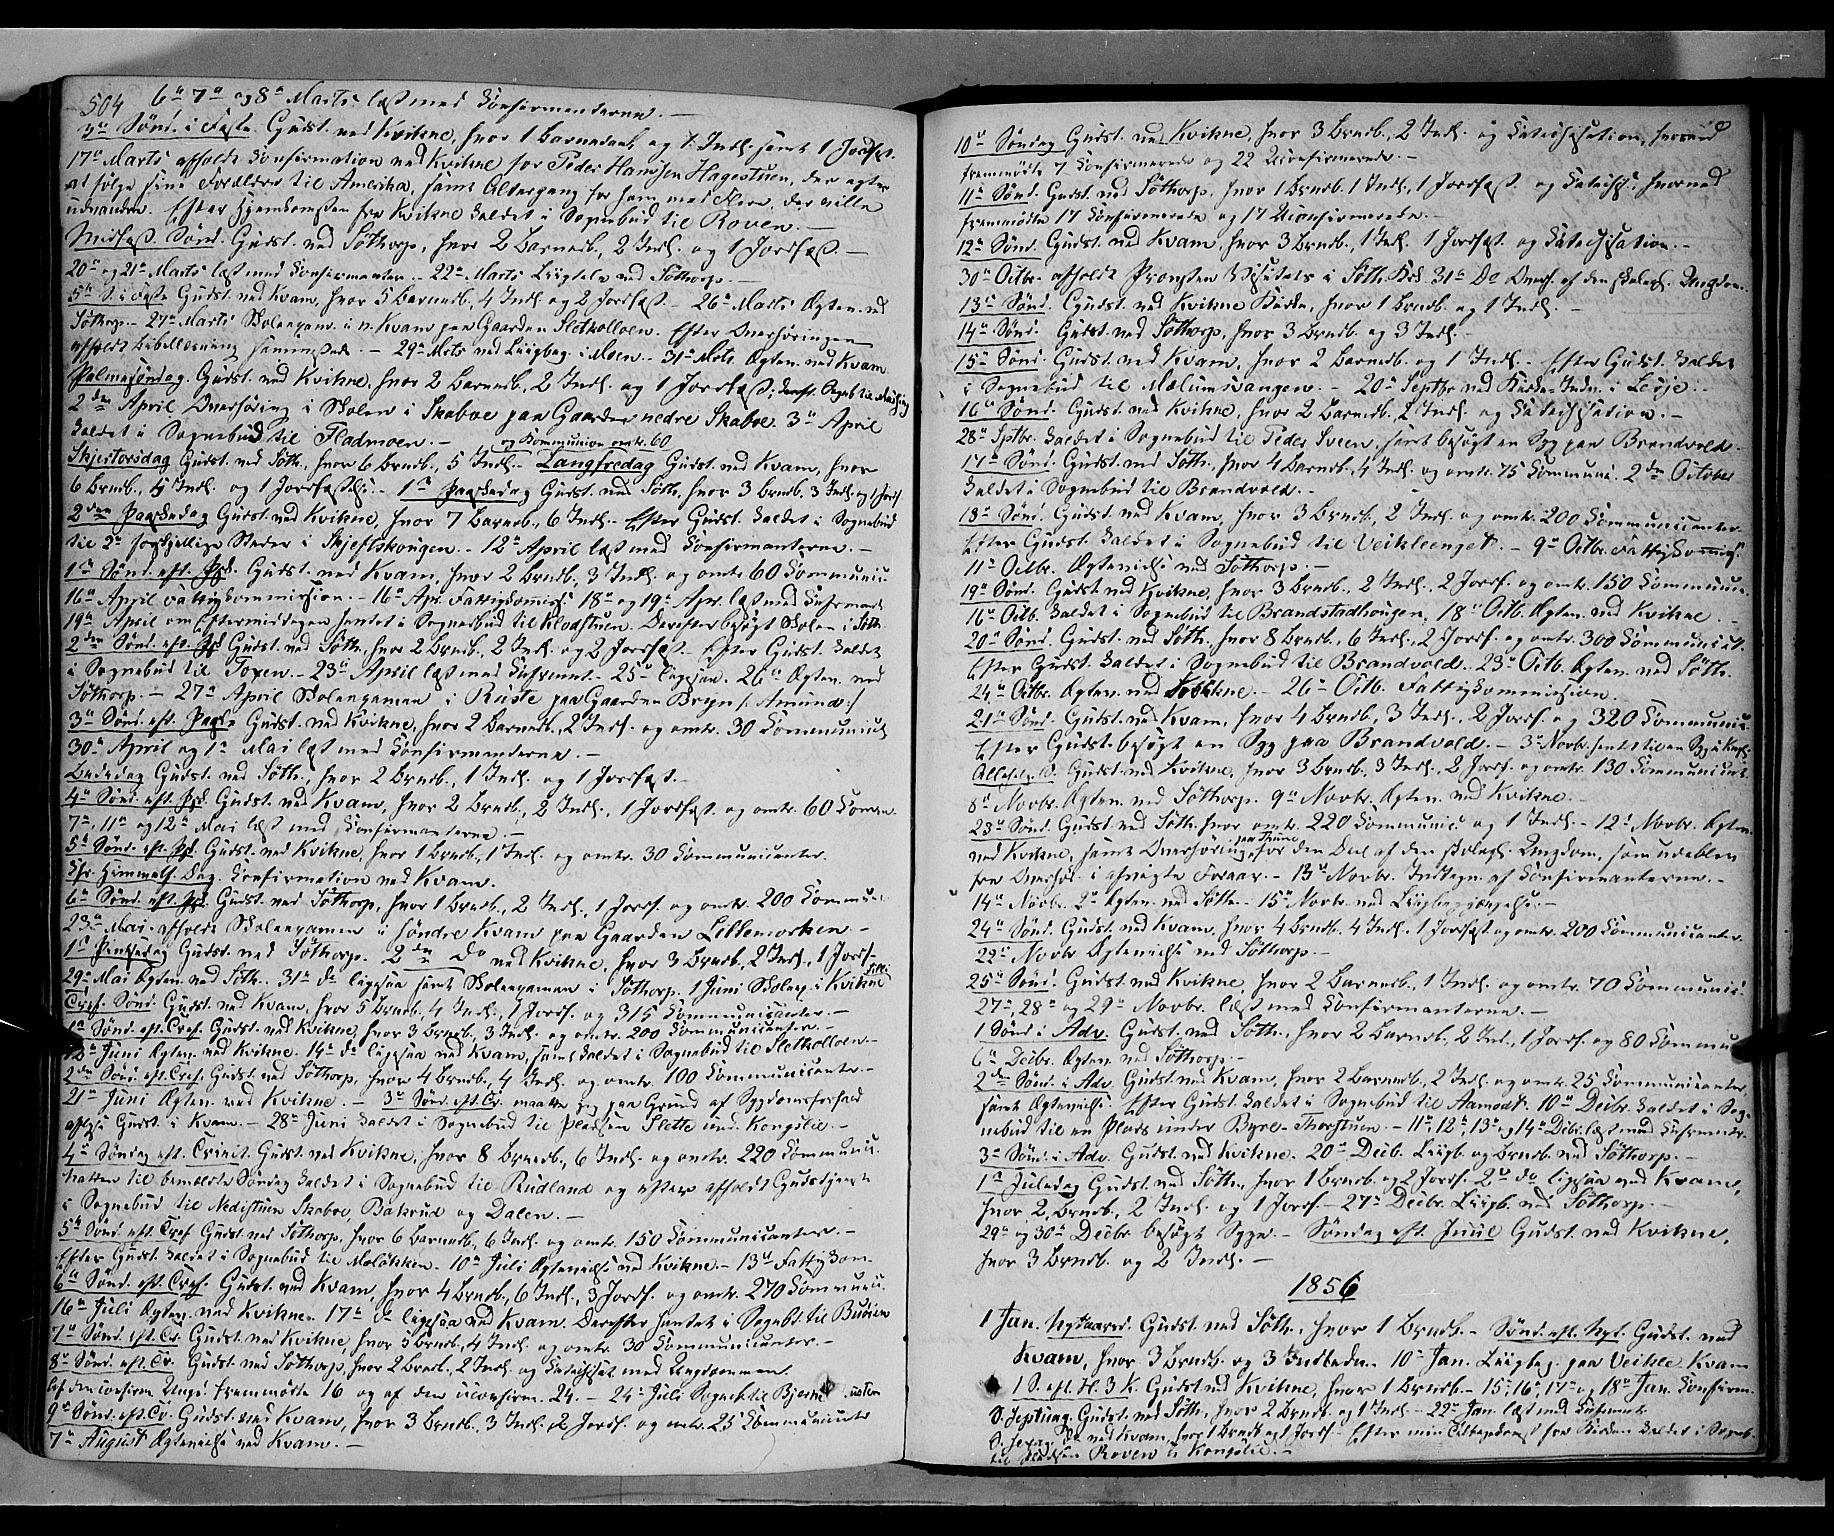 SAH, Nord-Fron prestekontor, Ministerialbok nr. 1, 1851-1864, s. 504